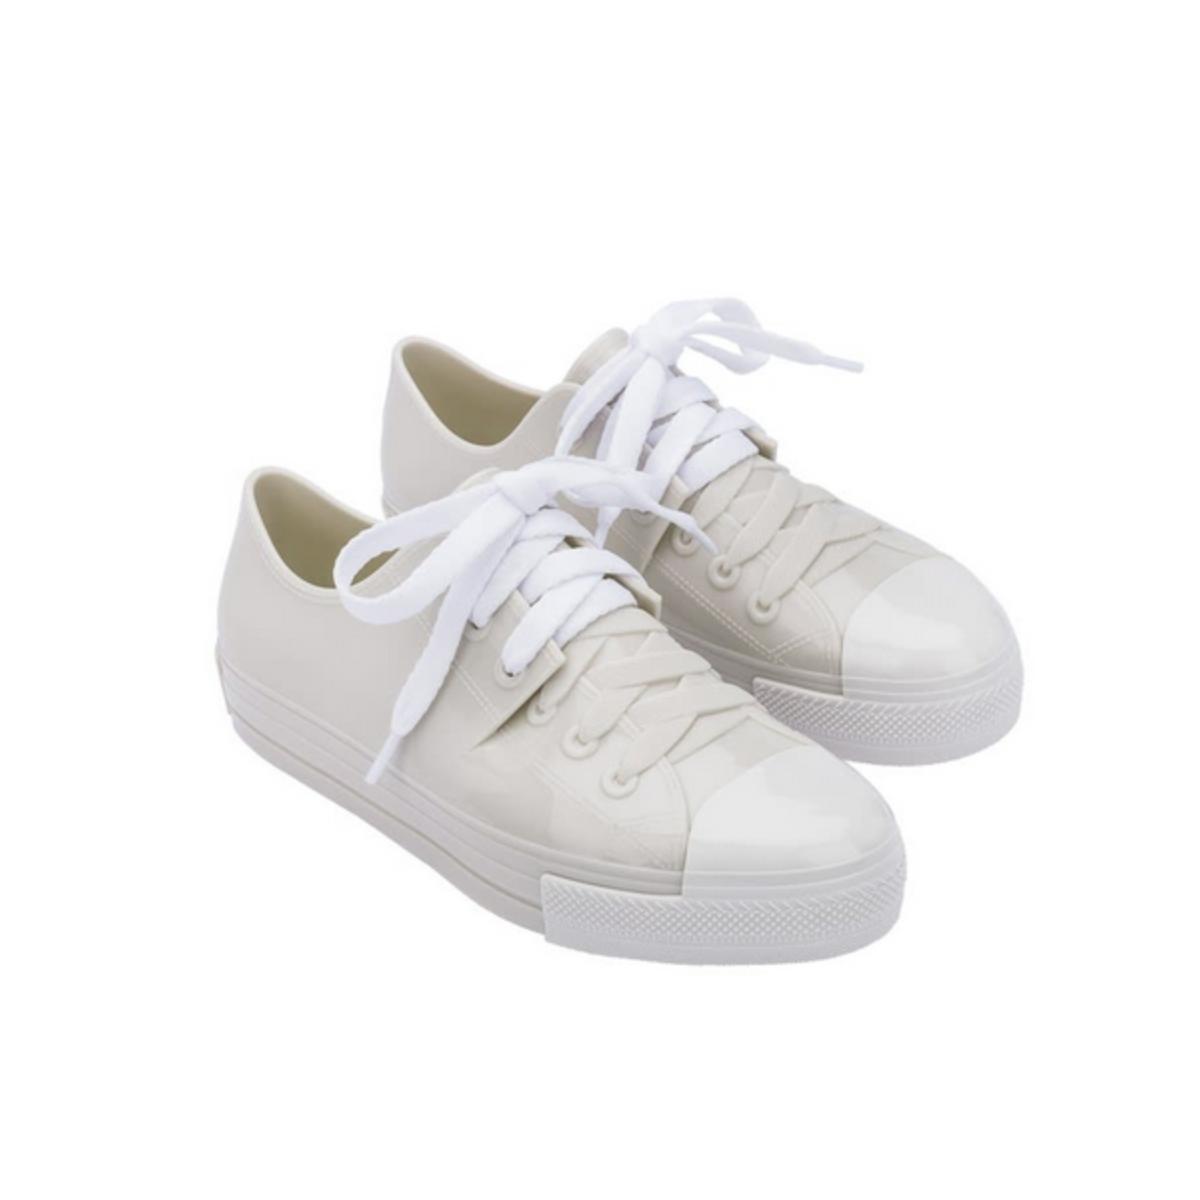 Tênis Feminino Melissa 32941 53388 Squad Sneaker Bege/branco/vermelho